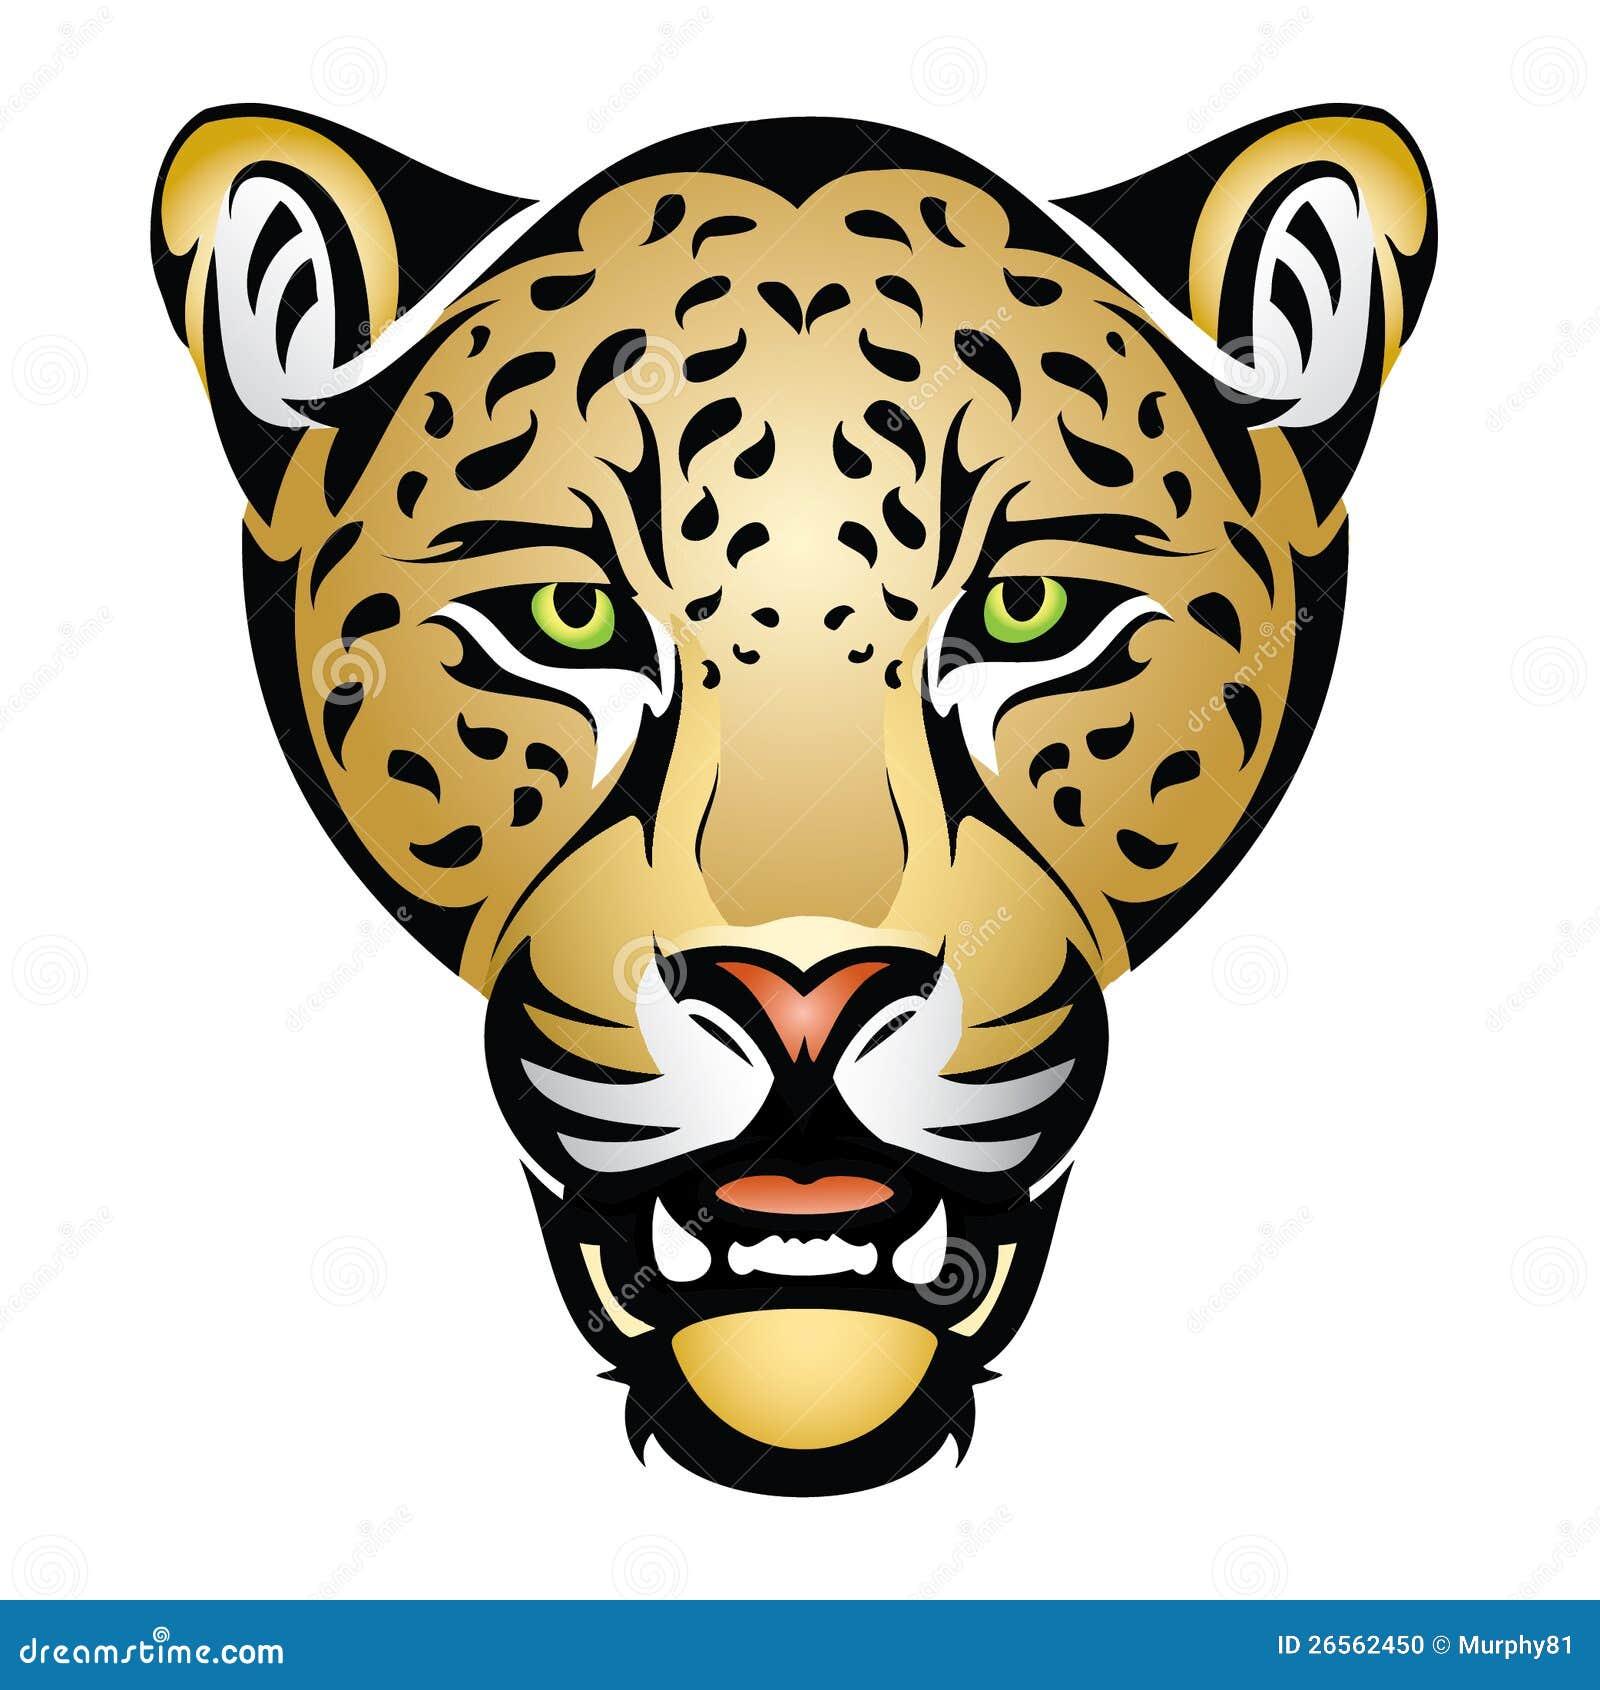 jaguar stock illustrations 4 686 jaguar stock illustrations rh dreamstime com Jaguar Mascot Blue Jaguar Basketball Mascot